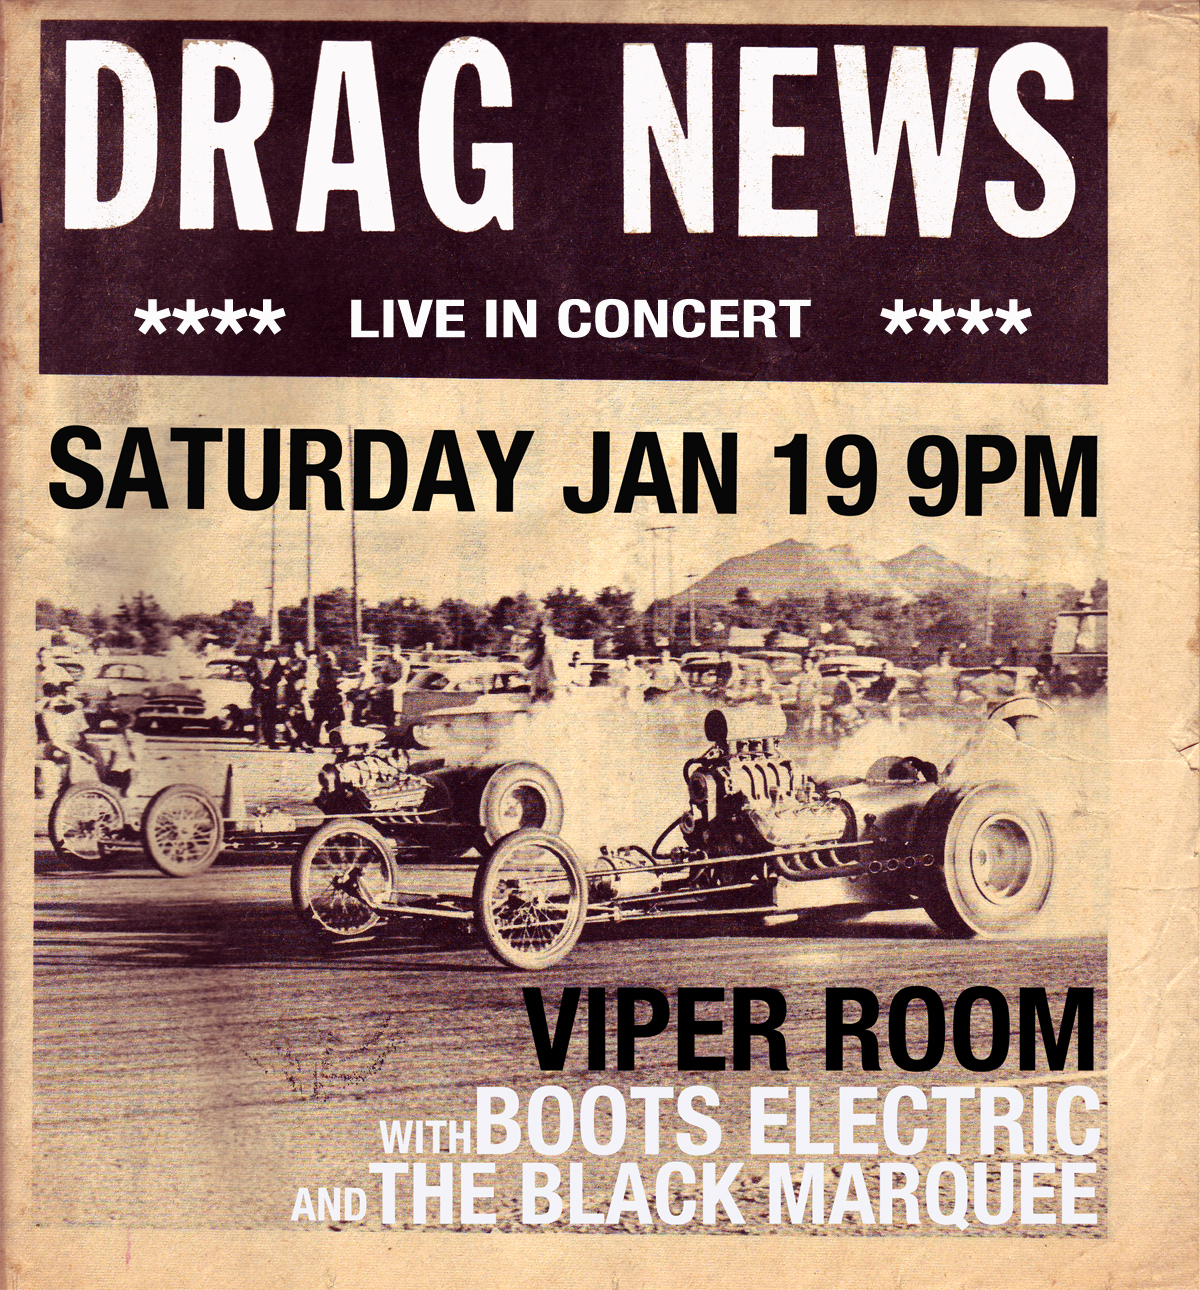 DRAG-NEWS-liveinconcert.jpg